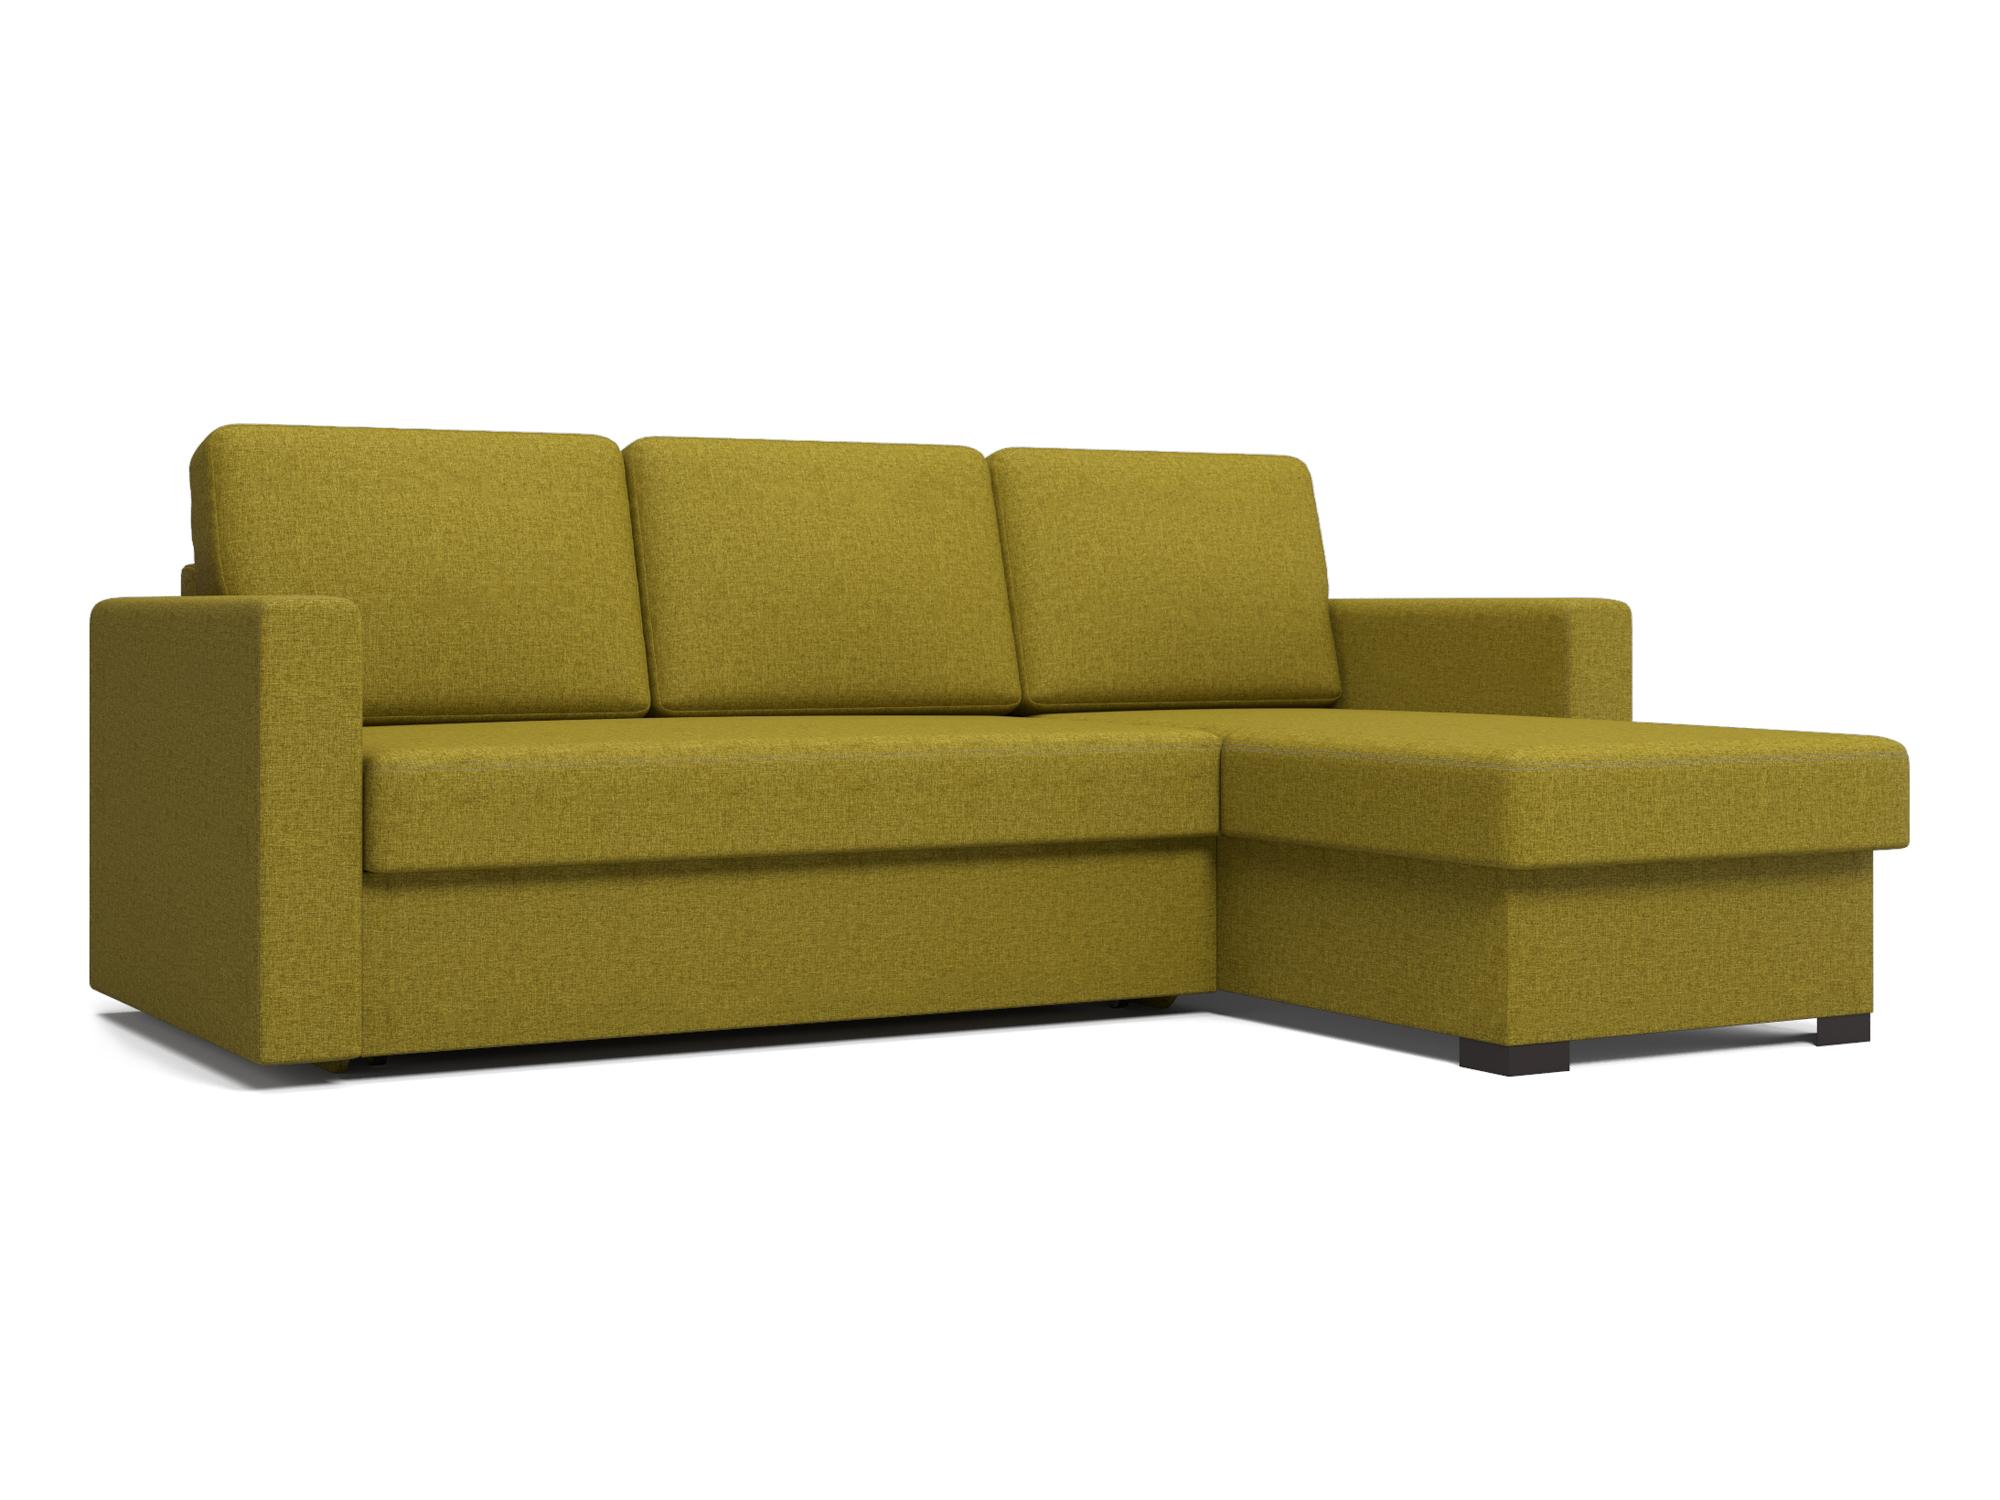 Угловой диван Траумберг (Порту, Торонто, Фишер) MebelVia Зеленый